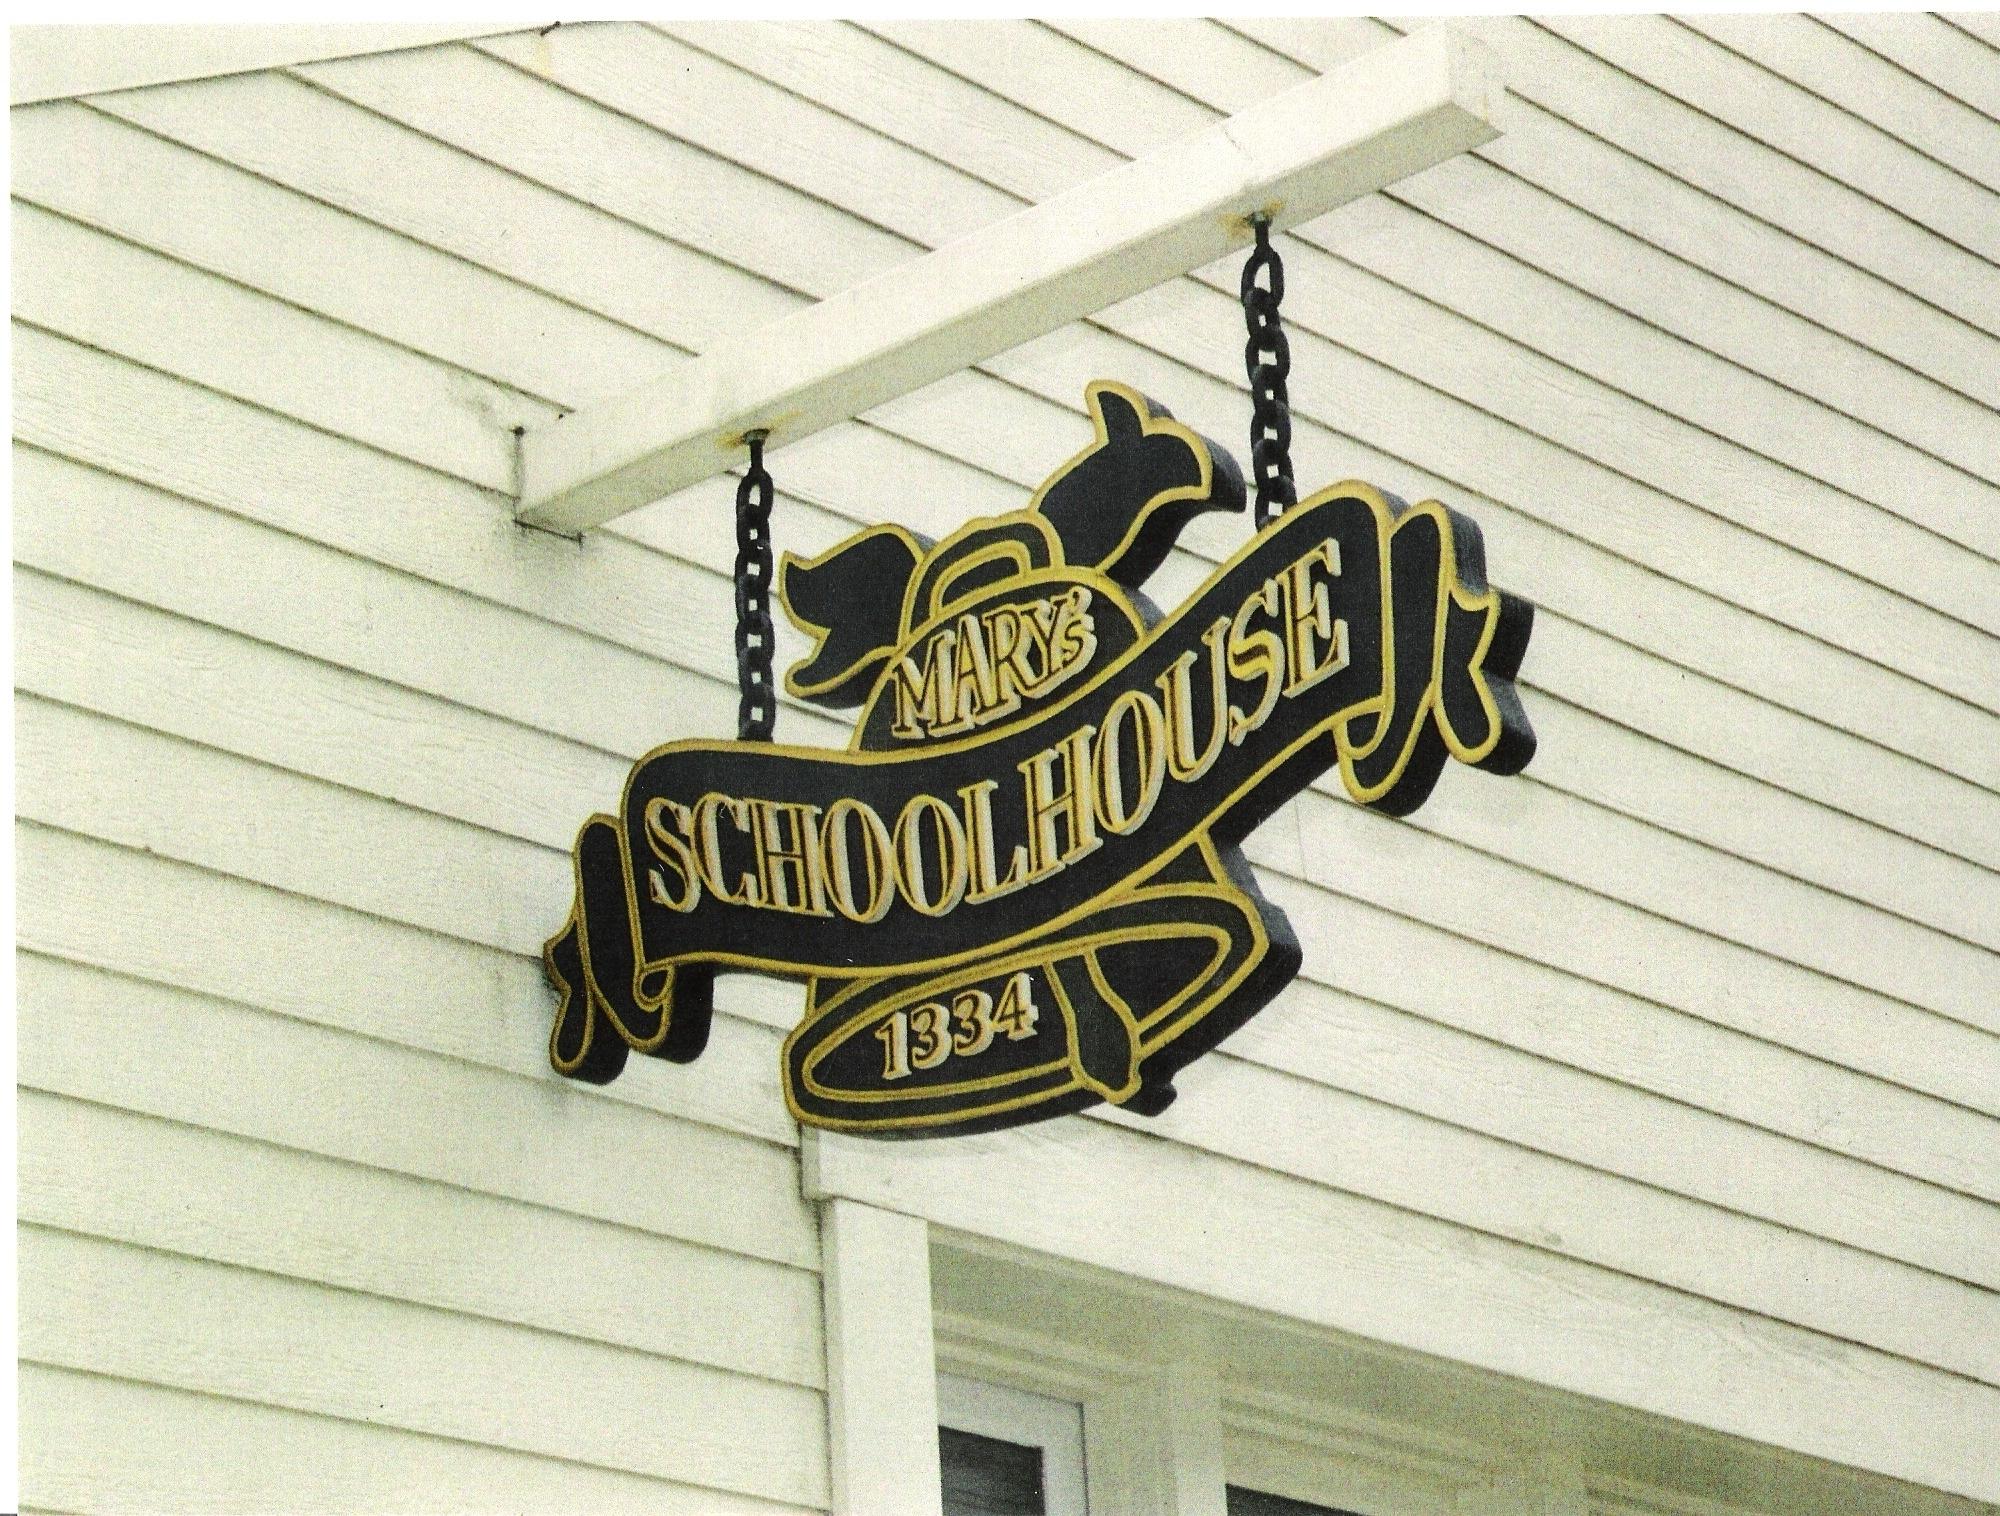 3D Wooden Exterior Sign. 4' x 3'.